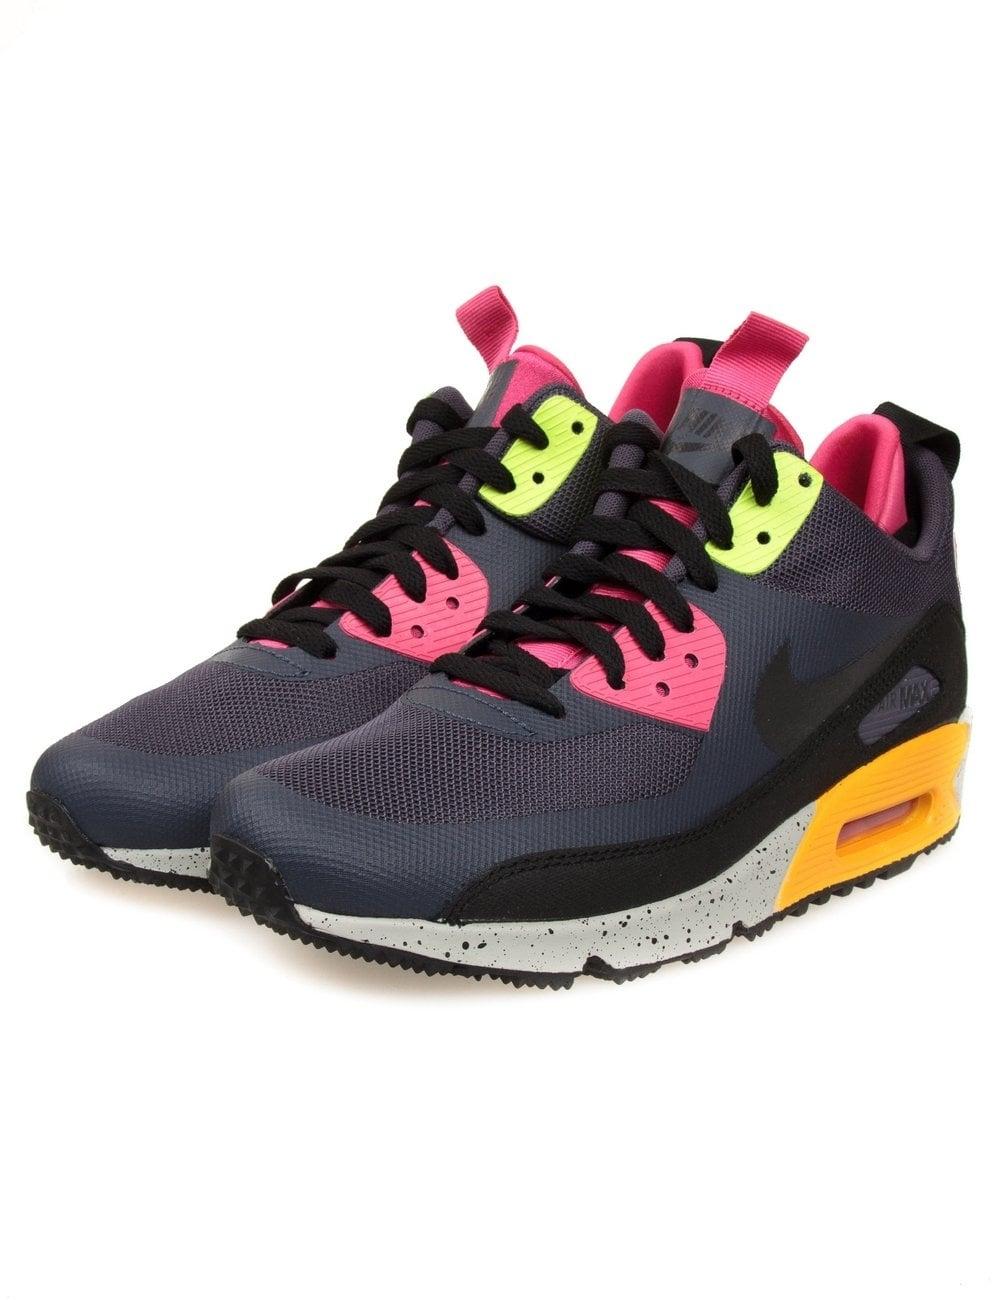 Nike Air Max 90 Sneakerboot - Gridiron - Footwear from Fat Buddha ... 9def3c475